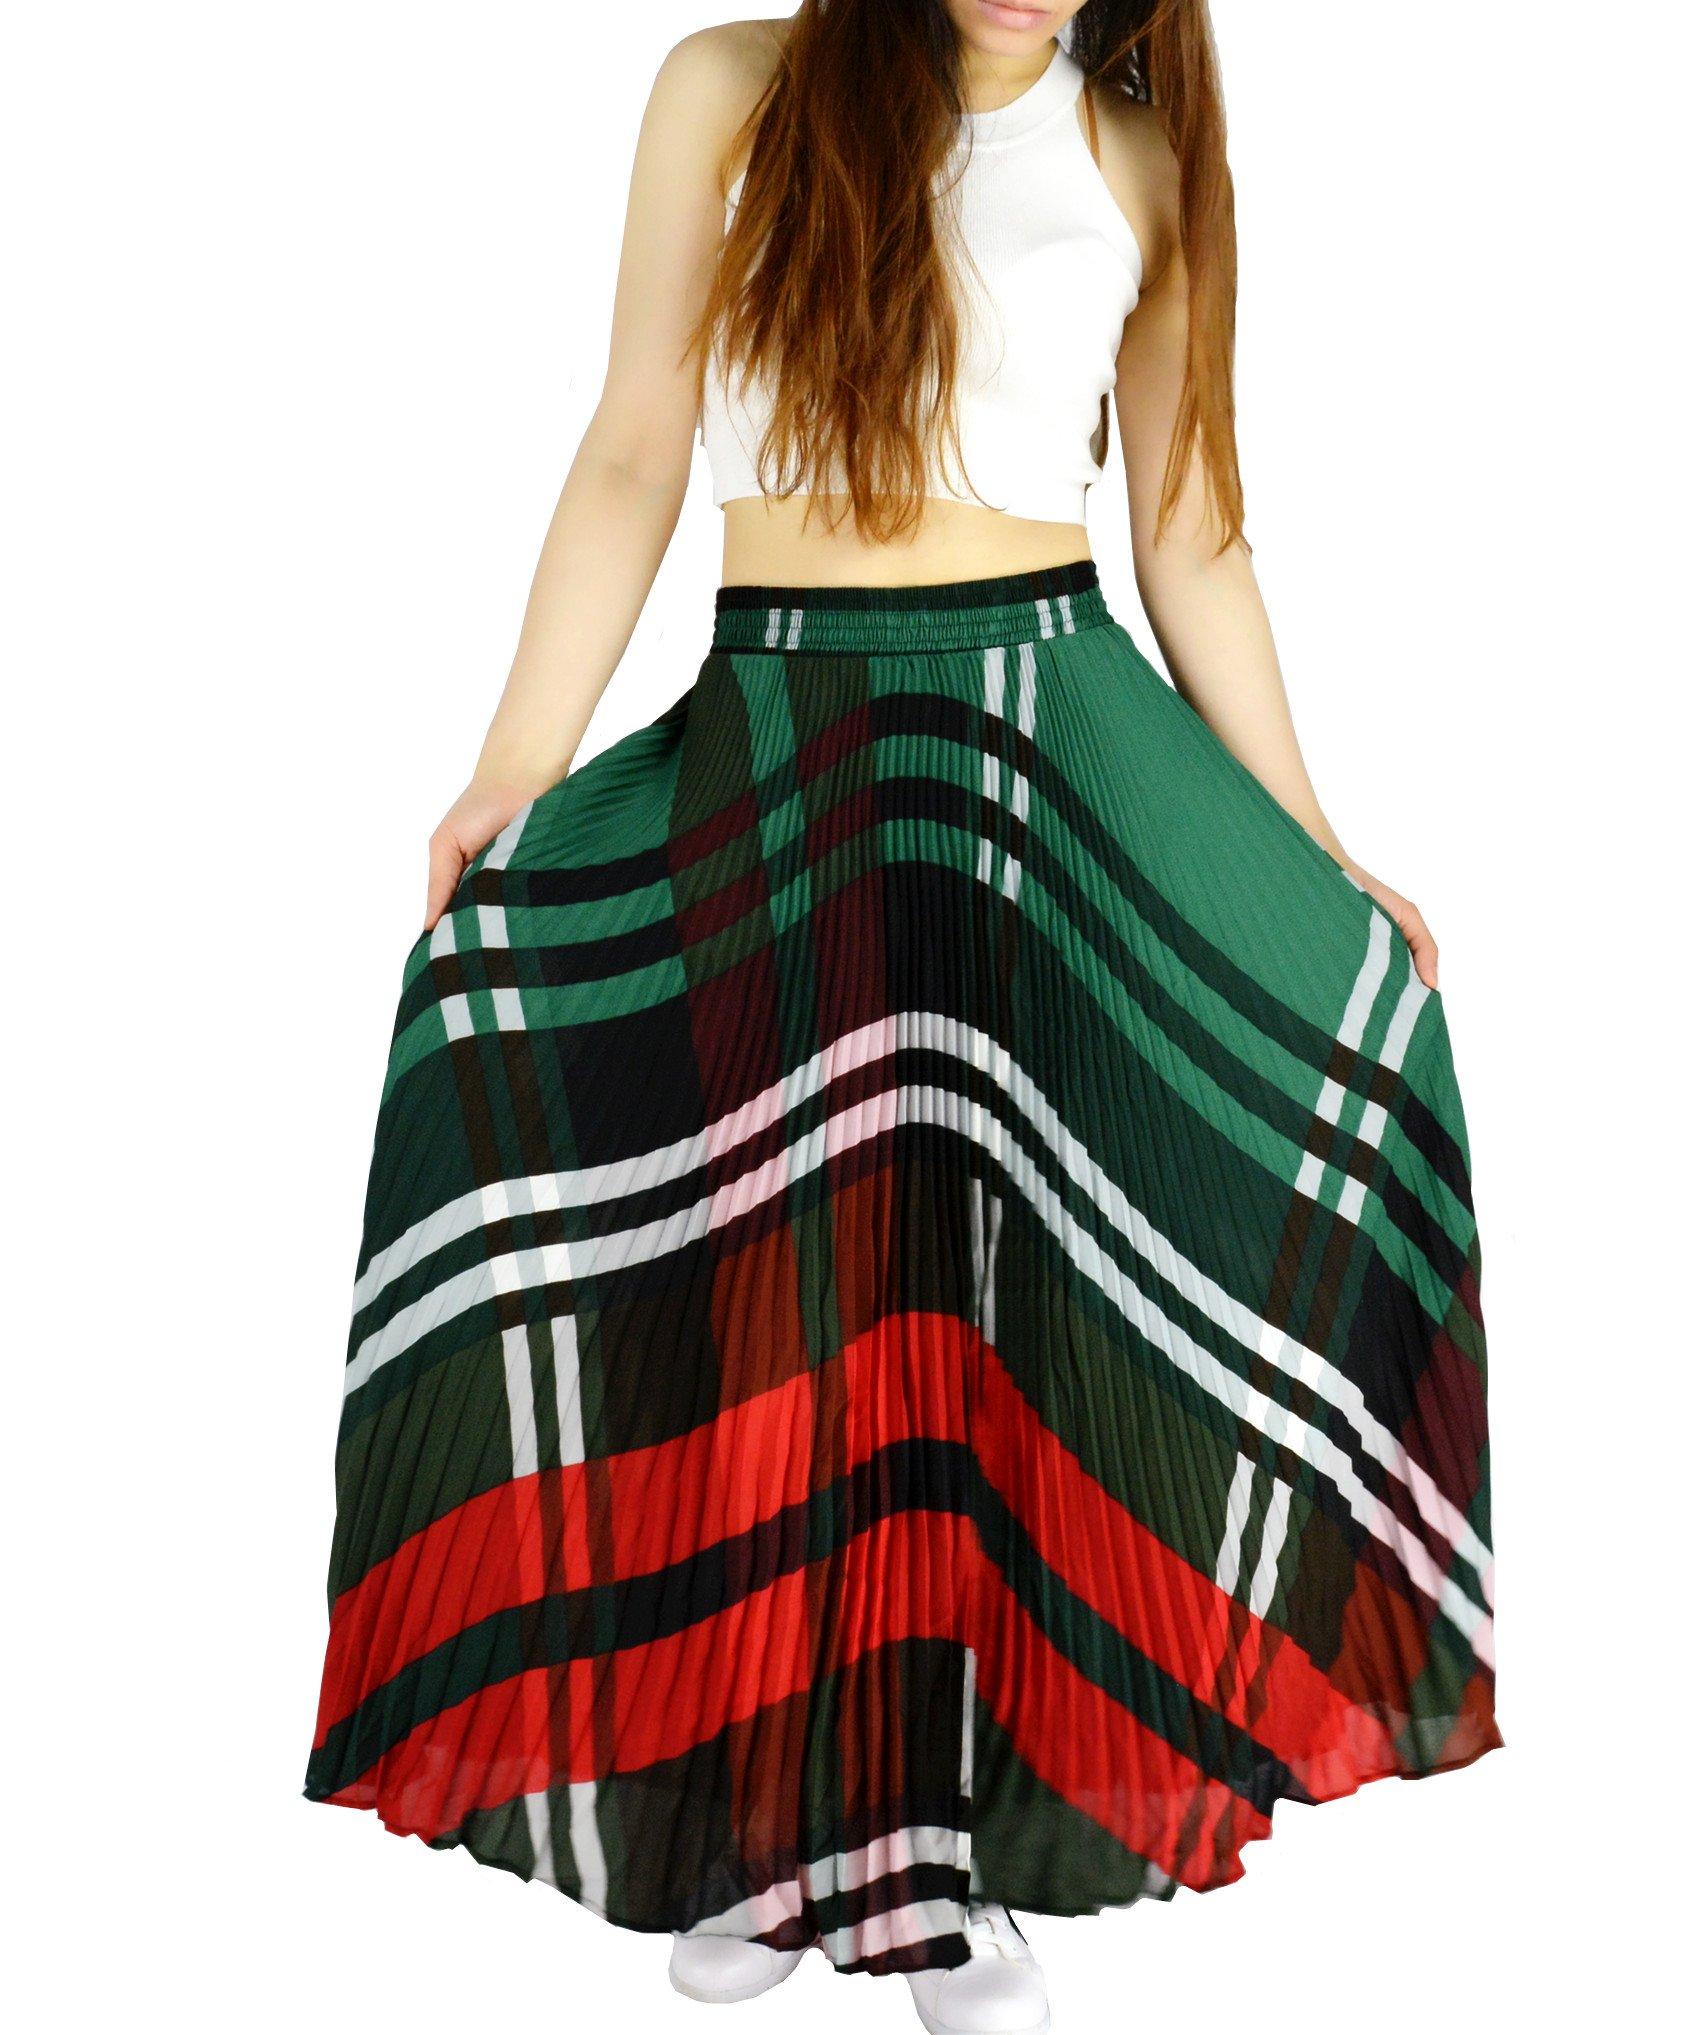 YSJ Womens Plaid Long Maxi Skirt - 360 Sunray Pleated Bohemian Full Skirt Skirts 1640